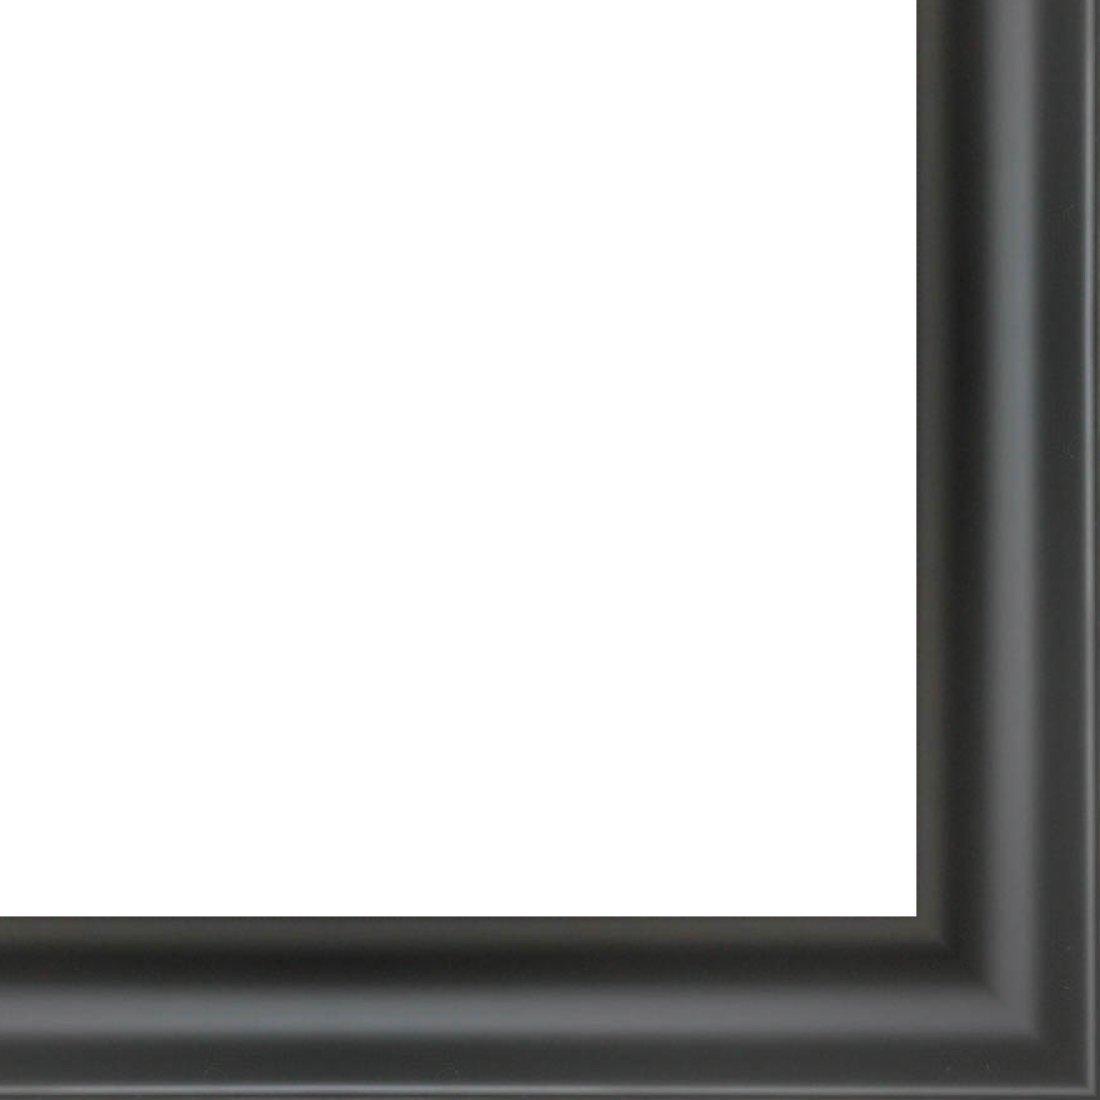 2.125 width Wood 18ft bundle 11//16 rabbet depth Contemporary Black Finish Picture Frame Moulding